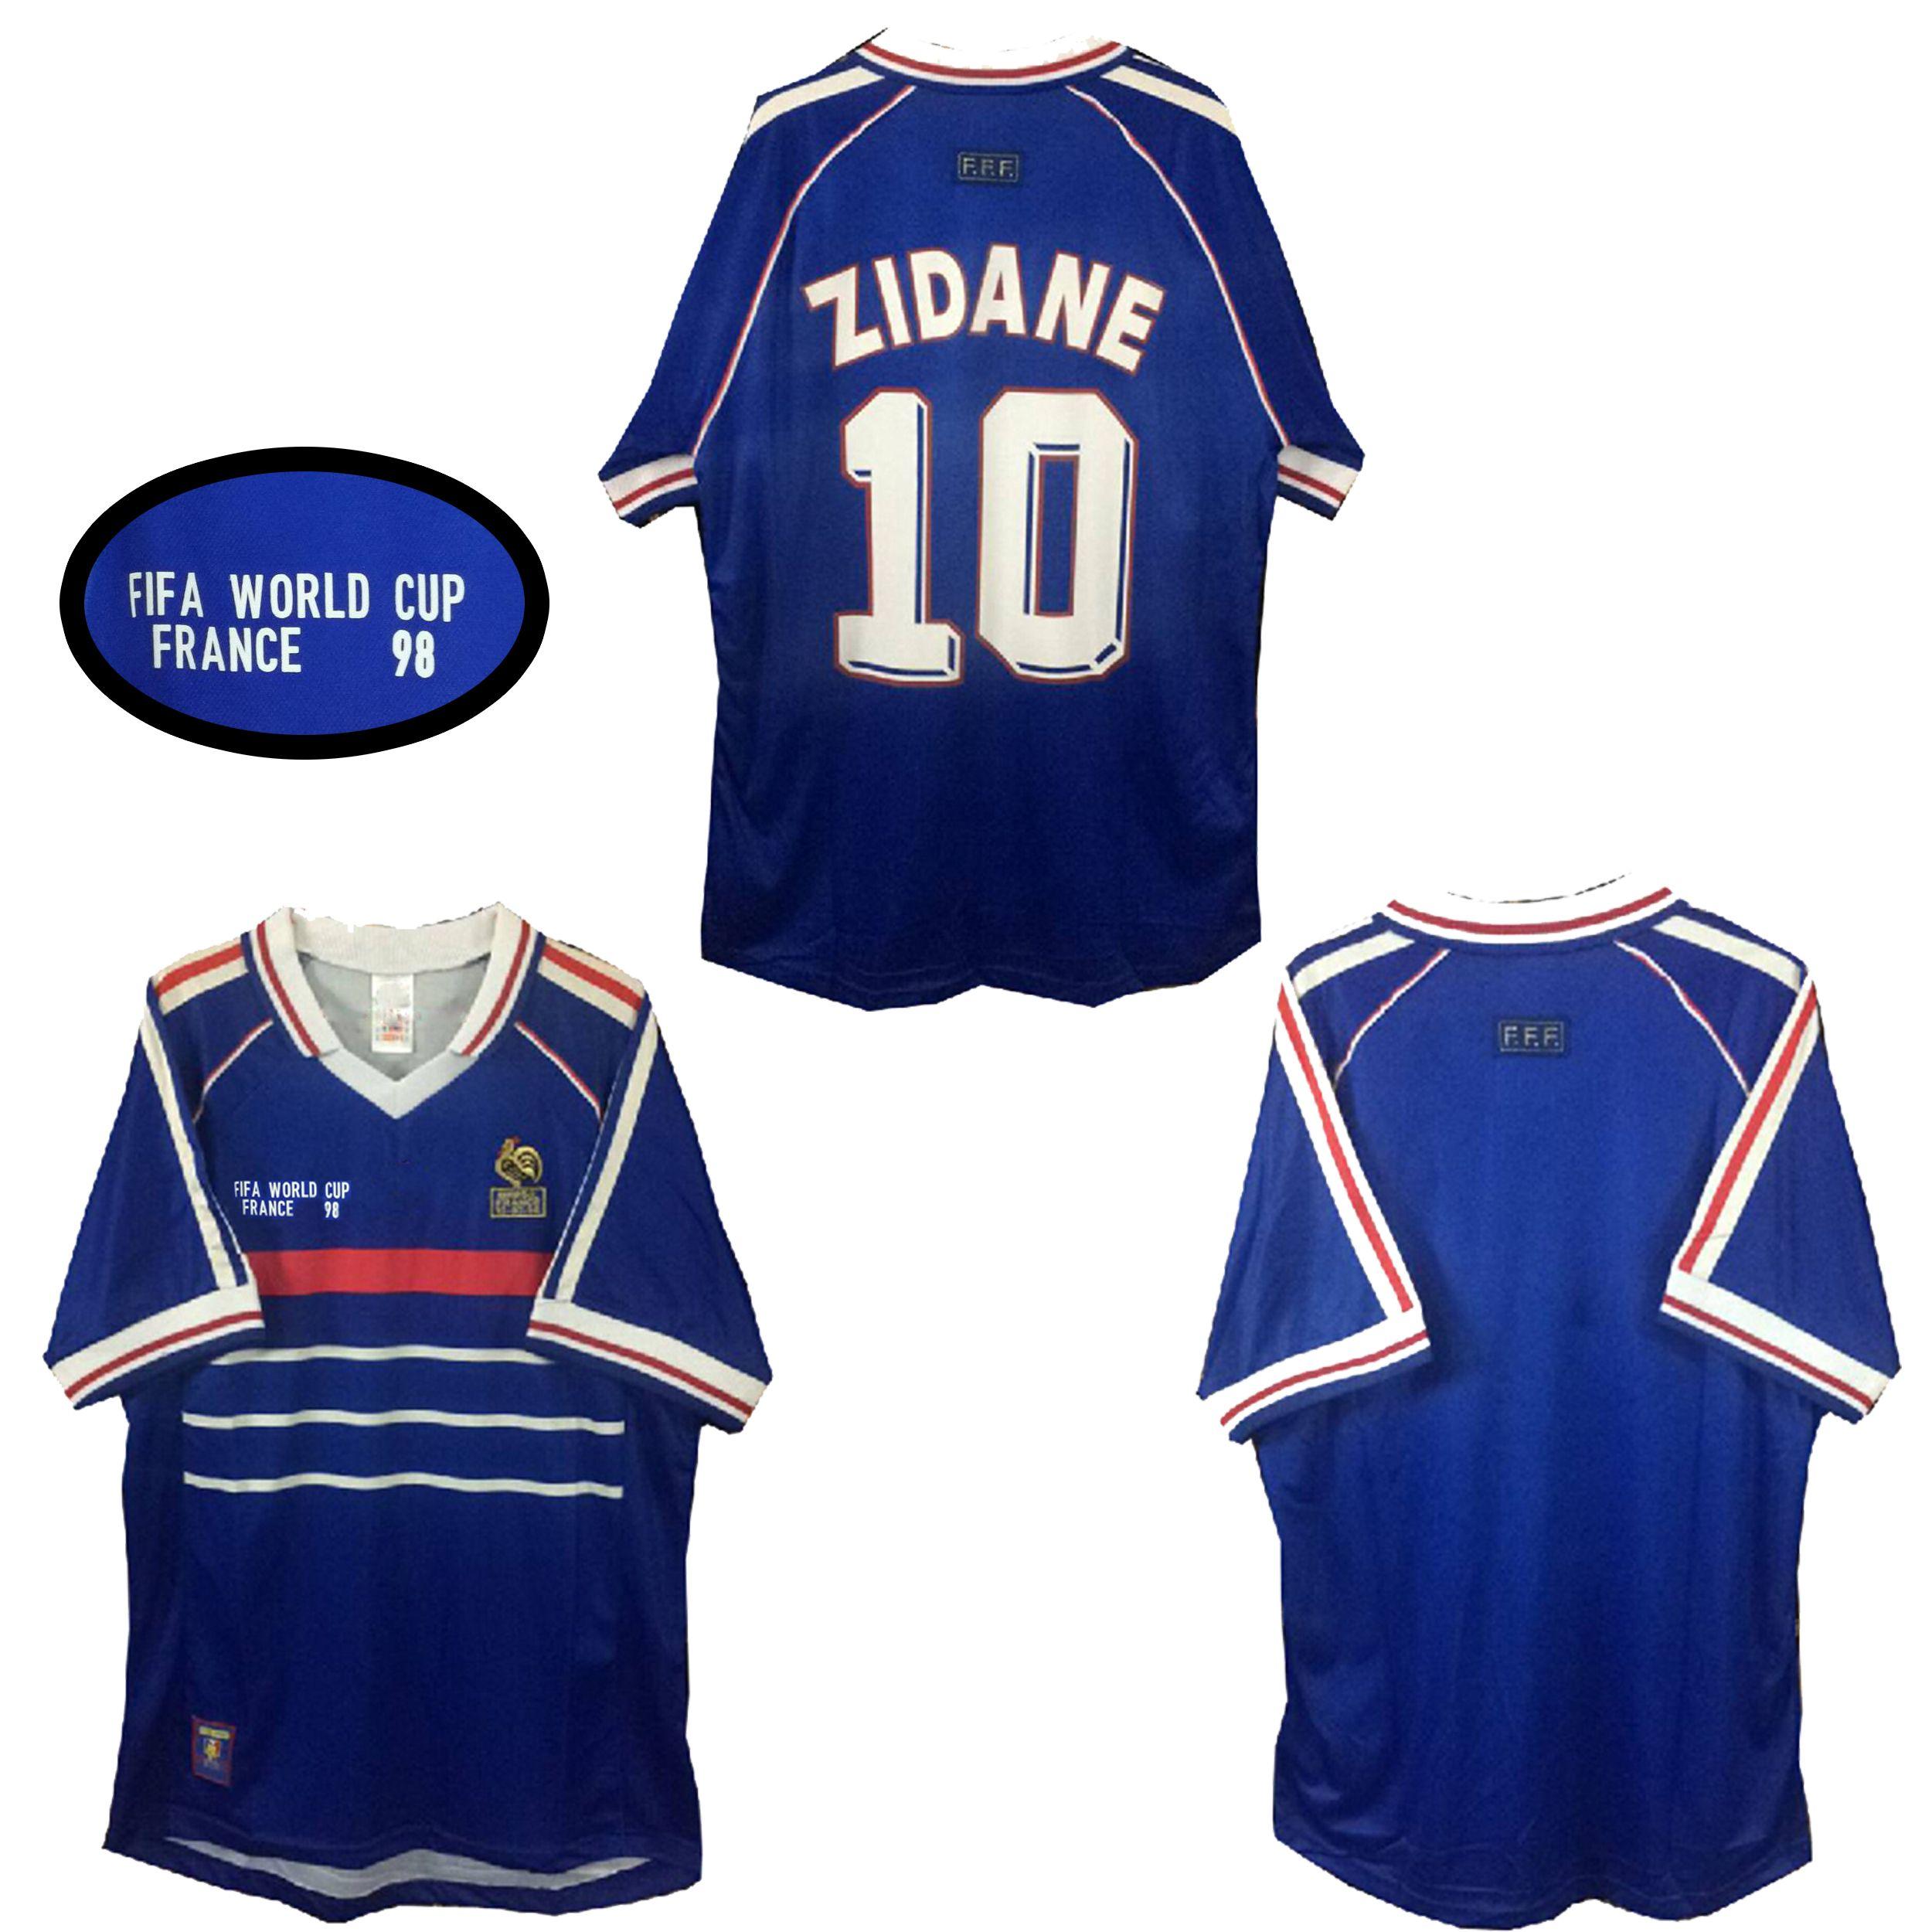 online retailer 87856 bd85c 1998 world cu FRANCE retro soccer jerseys home 1998 zidane Henry Soccer  Jerseys 1998 world cu FRANCE retro football shirts